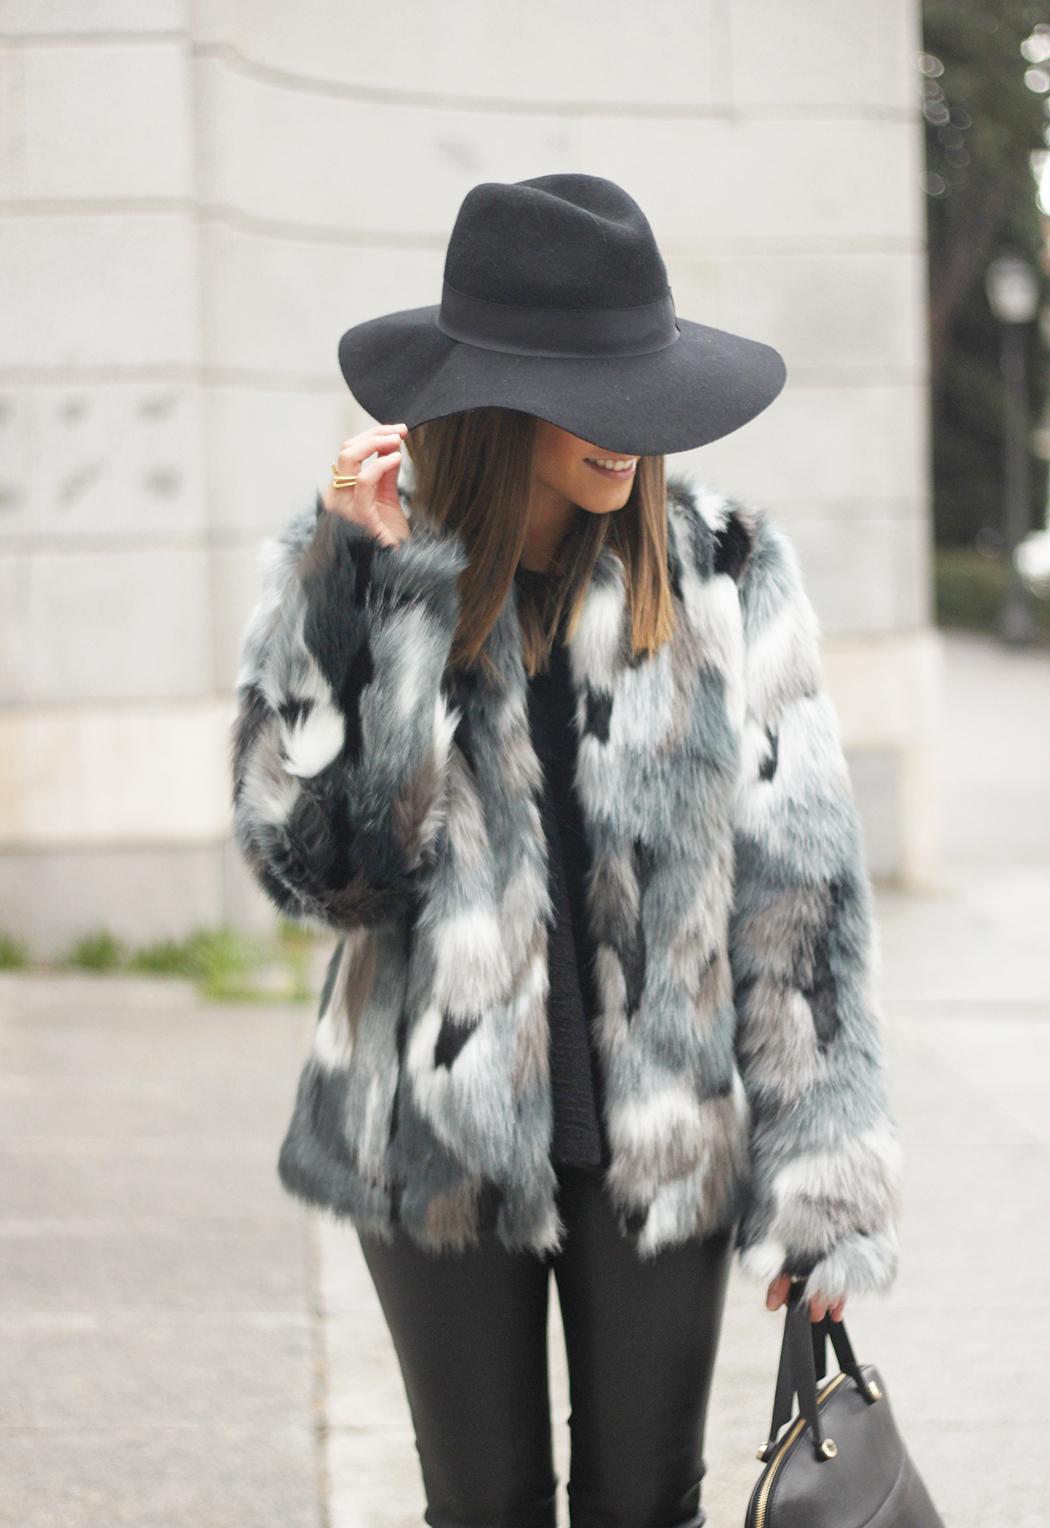 Faux fur coat leatherette pants booties black hat mango streetstyle fashion outfit19